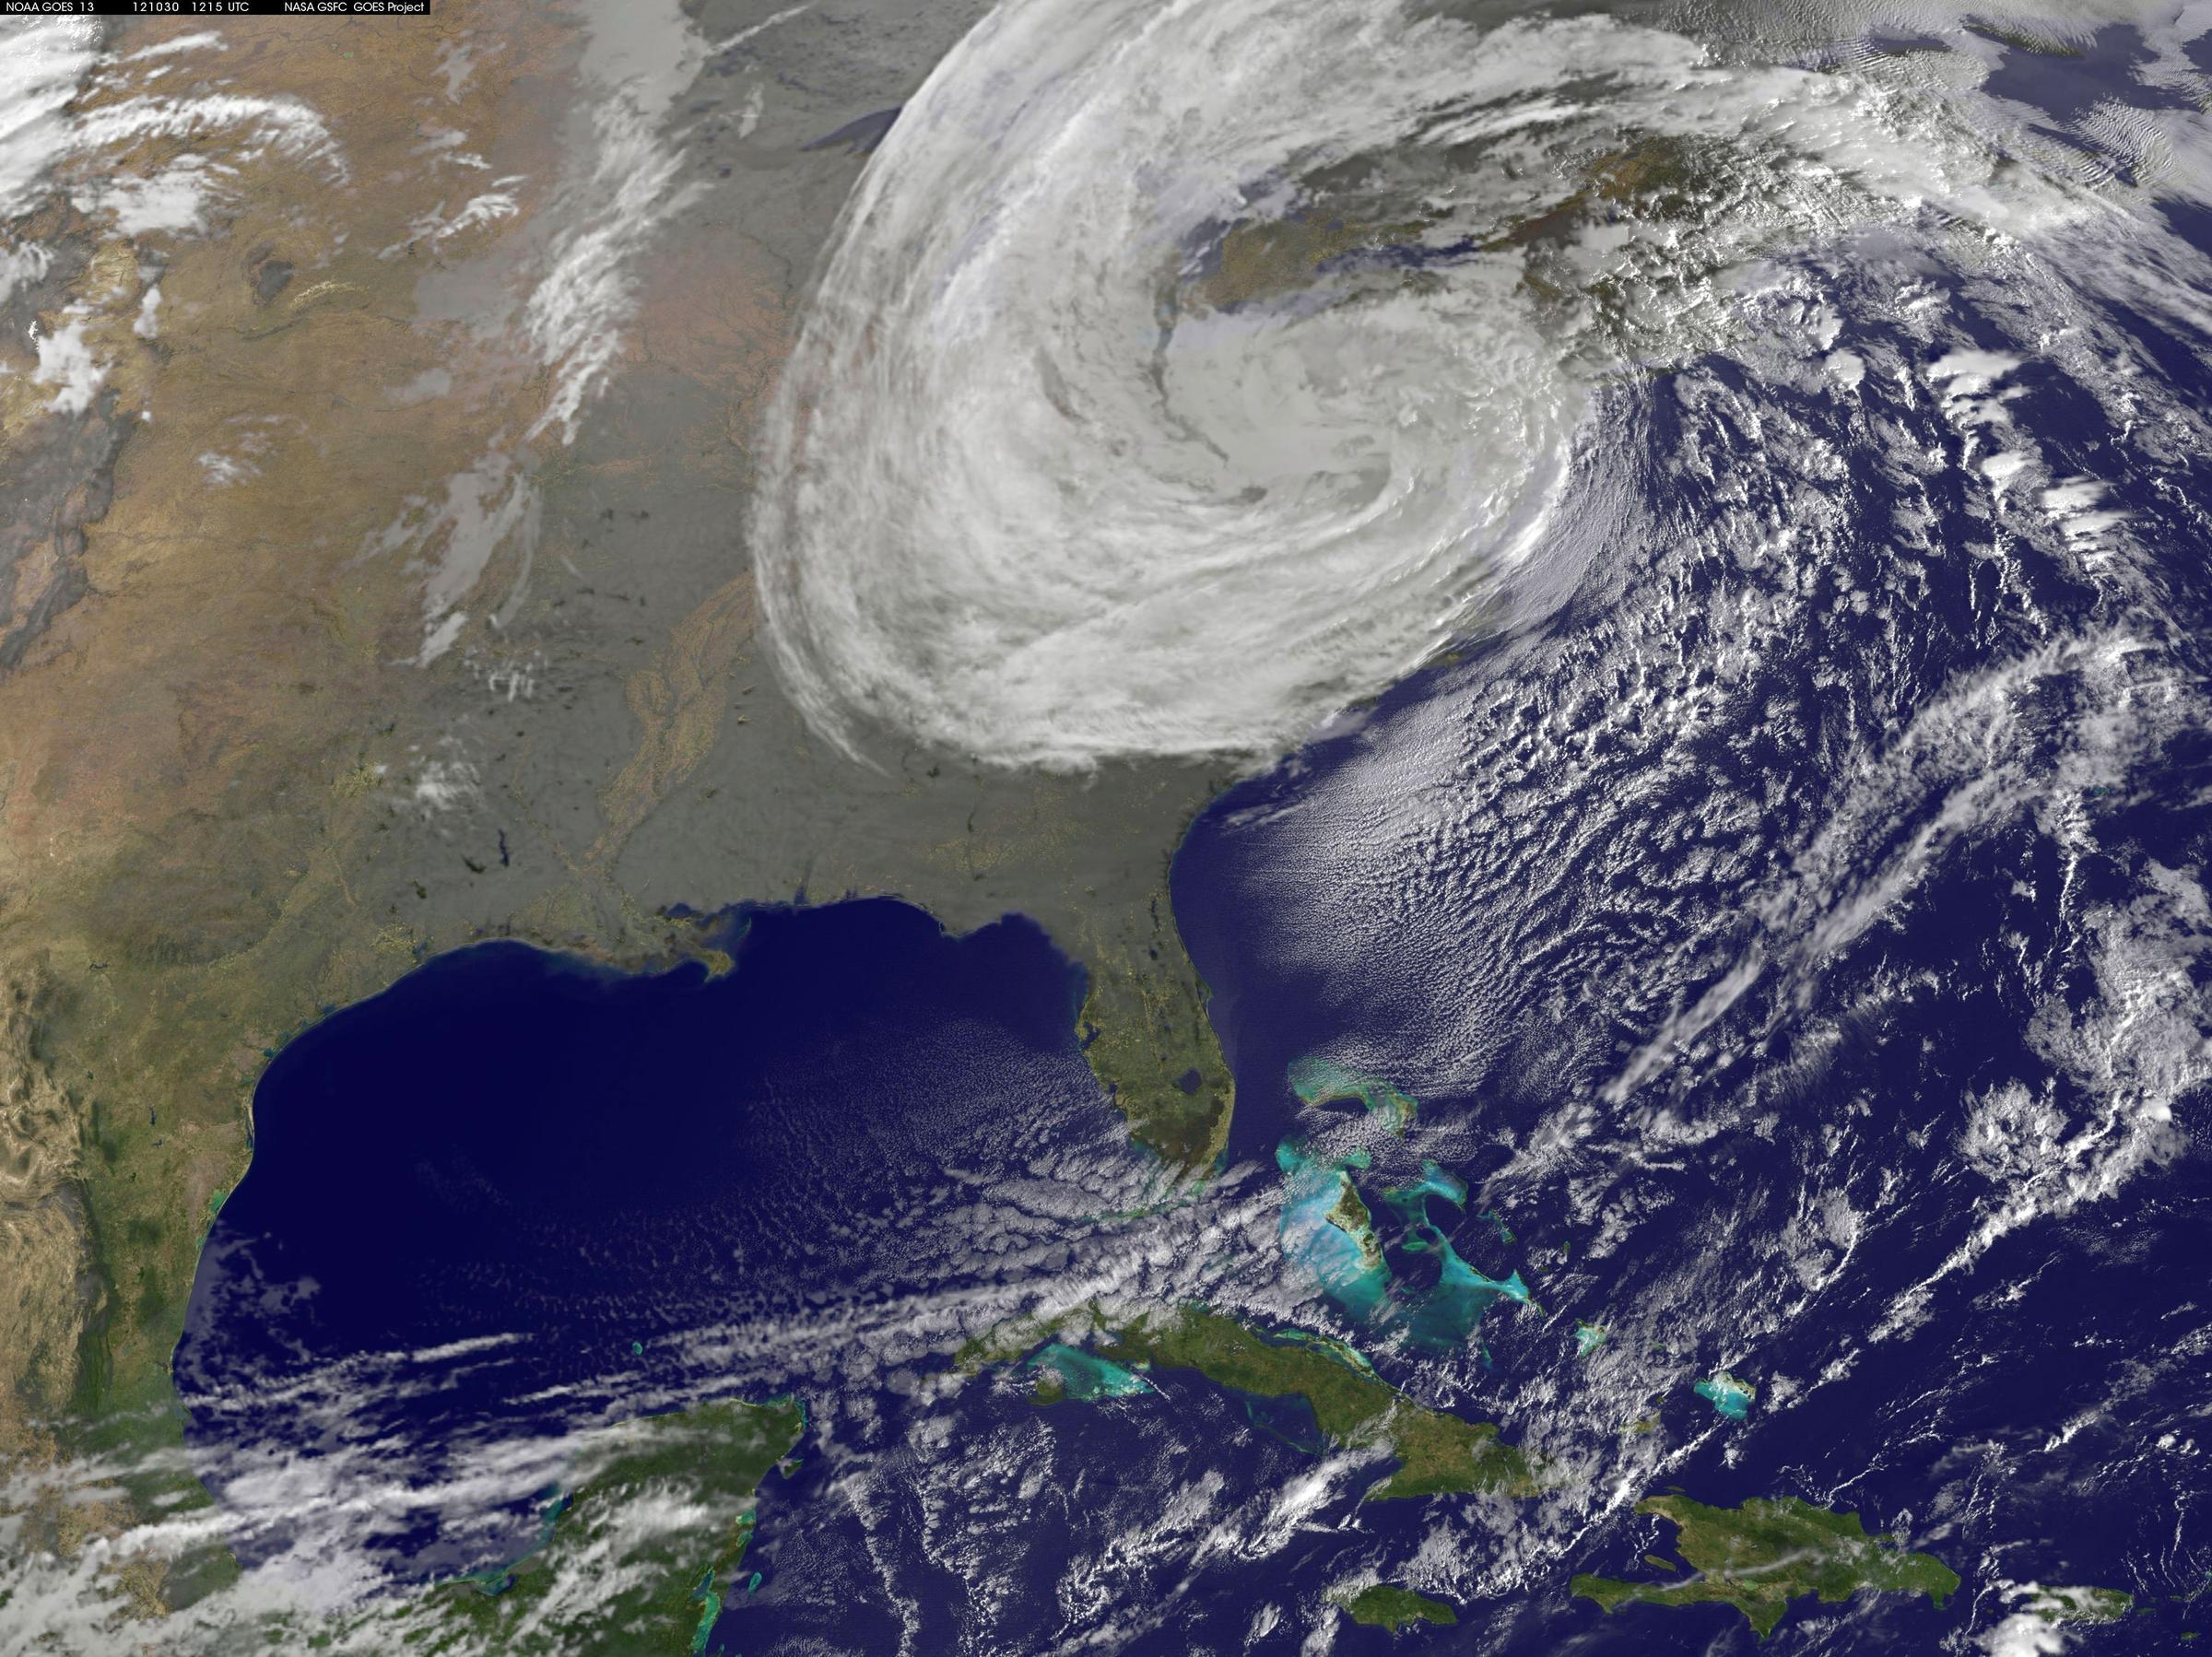 NOAA Forecasts Quiet Atlantic Hurricane Season In 2014 ... on noaa storm surge sandy, noaa storm surge prediction, 2003 tropical storm tracking maps, noaa sea level rise maps,